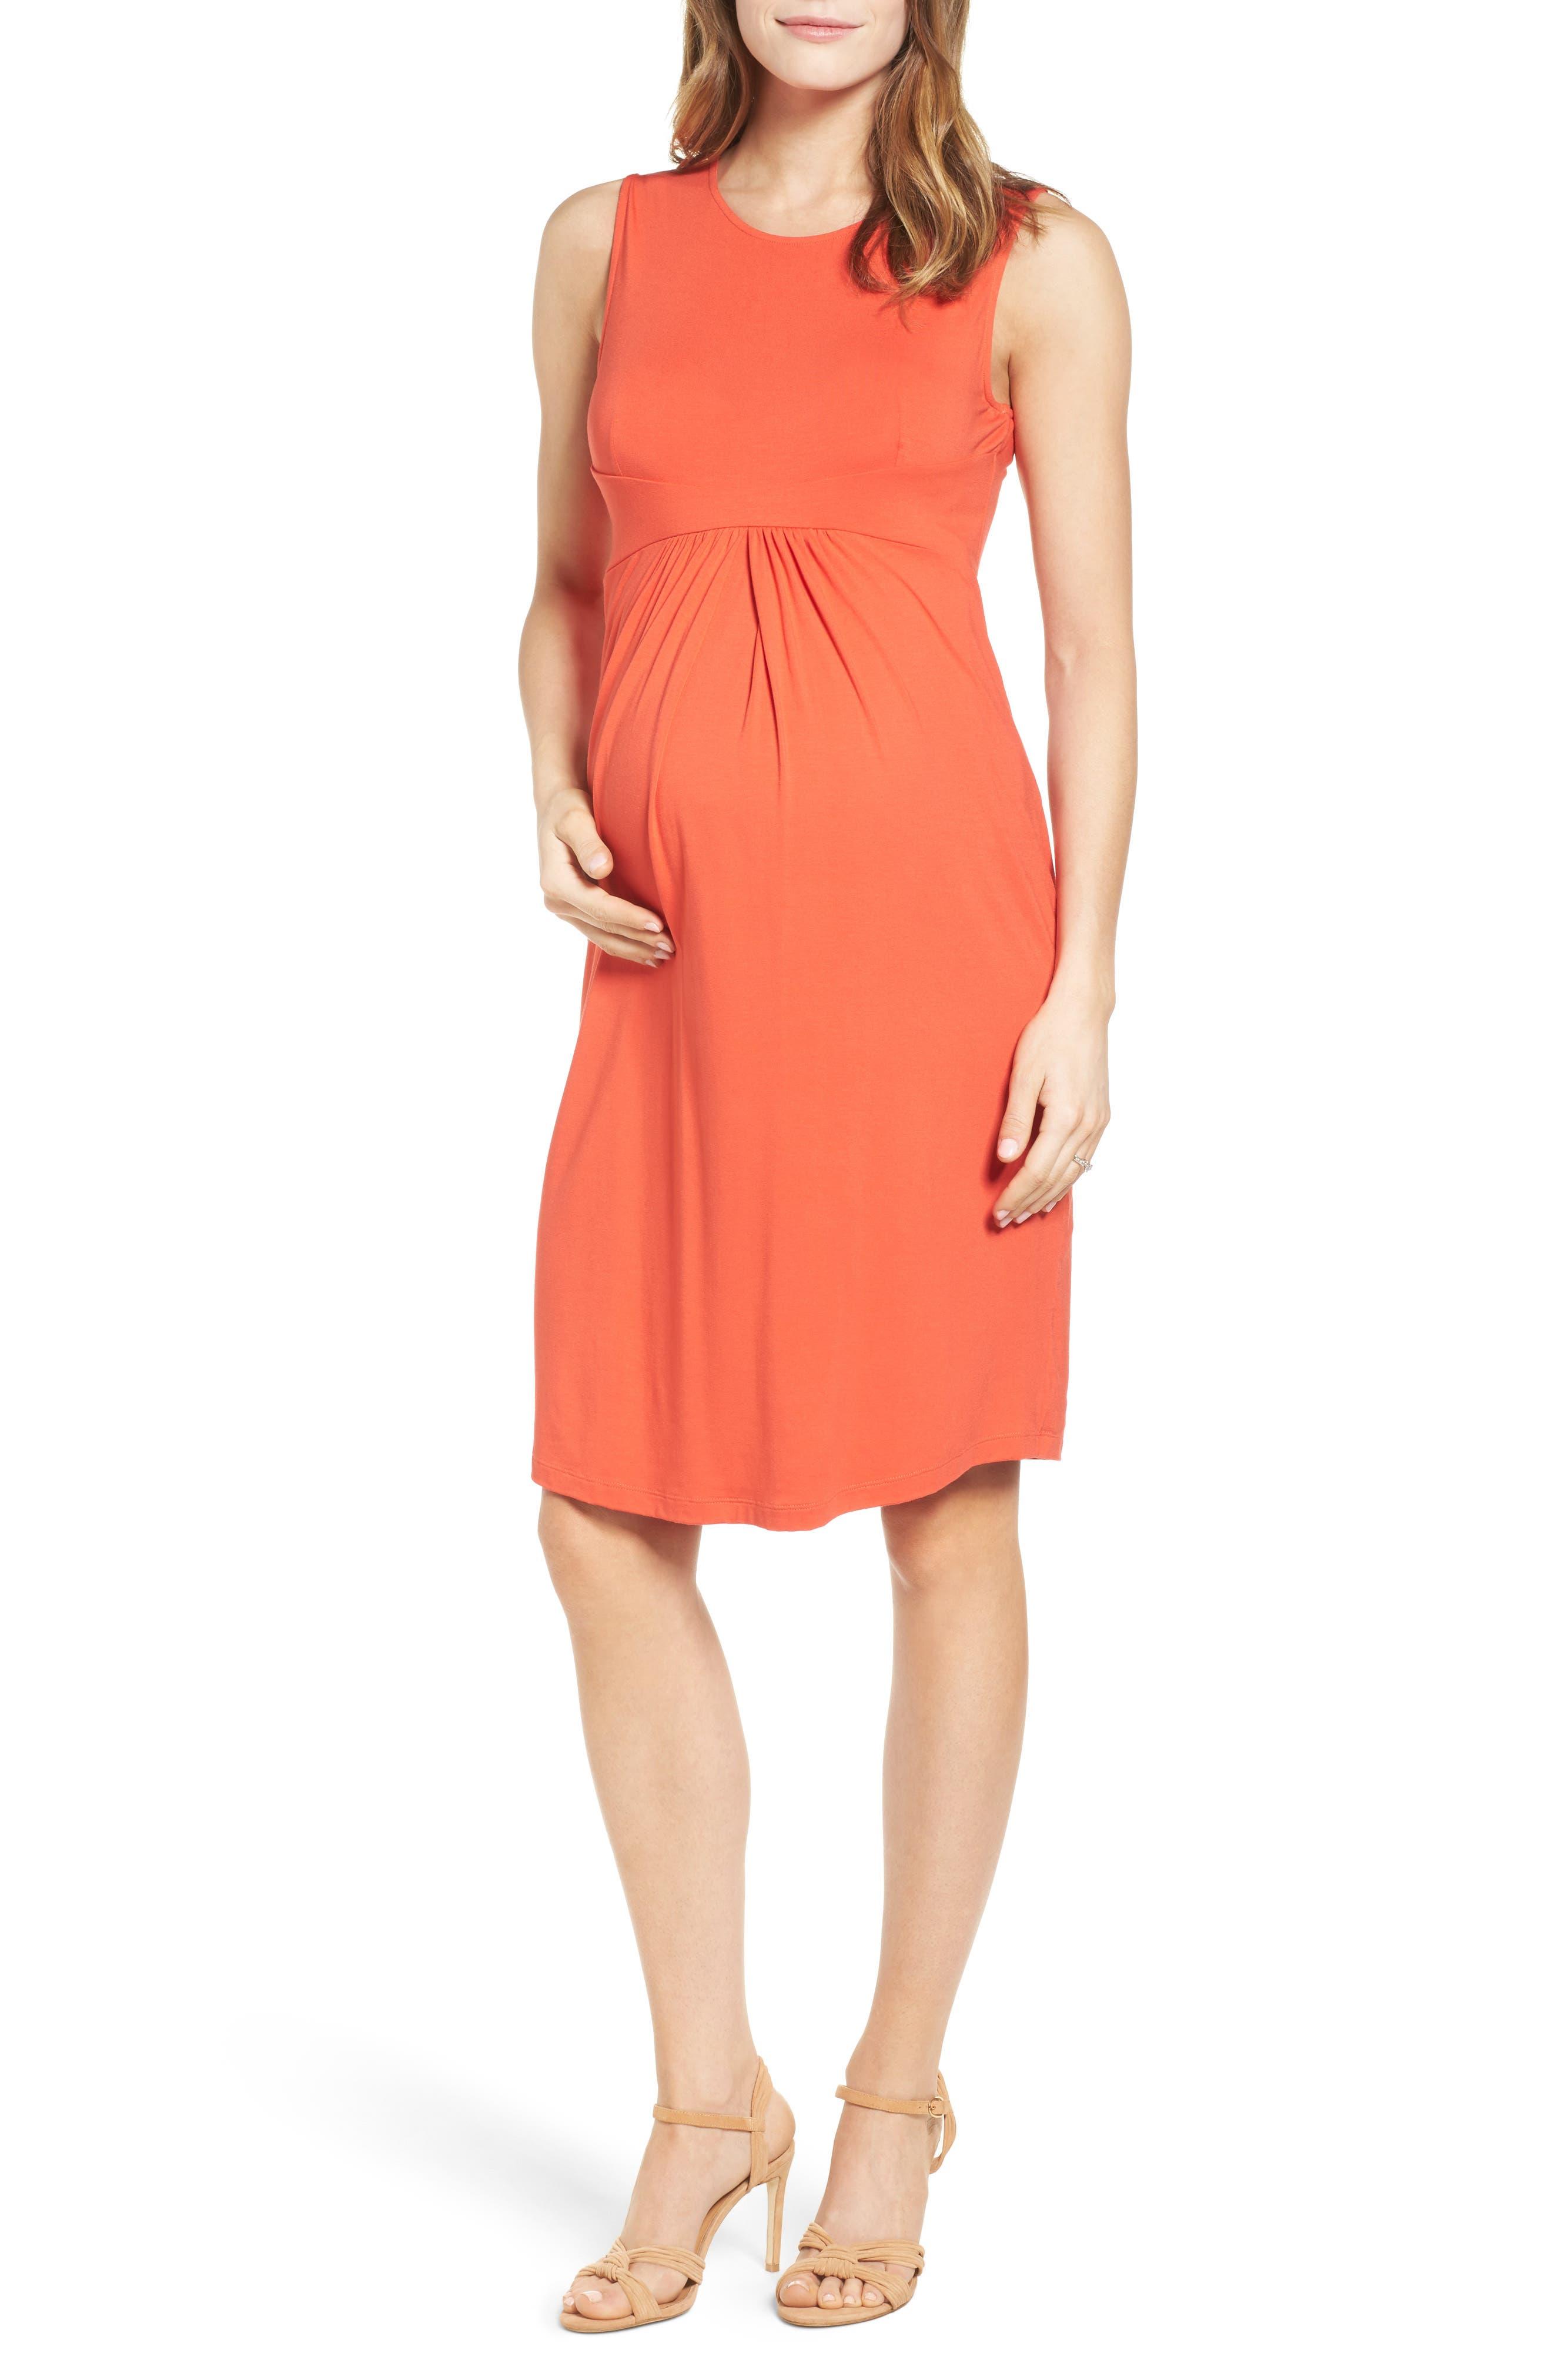 Coraline Maternity Shift Dress,                         Main,                         color, 950